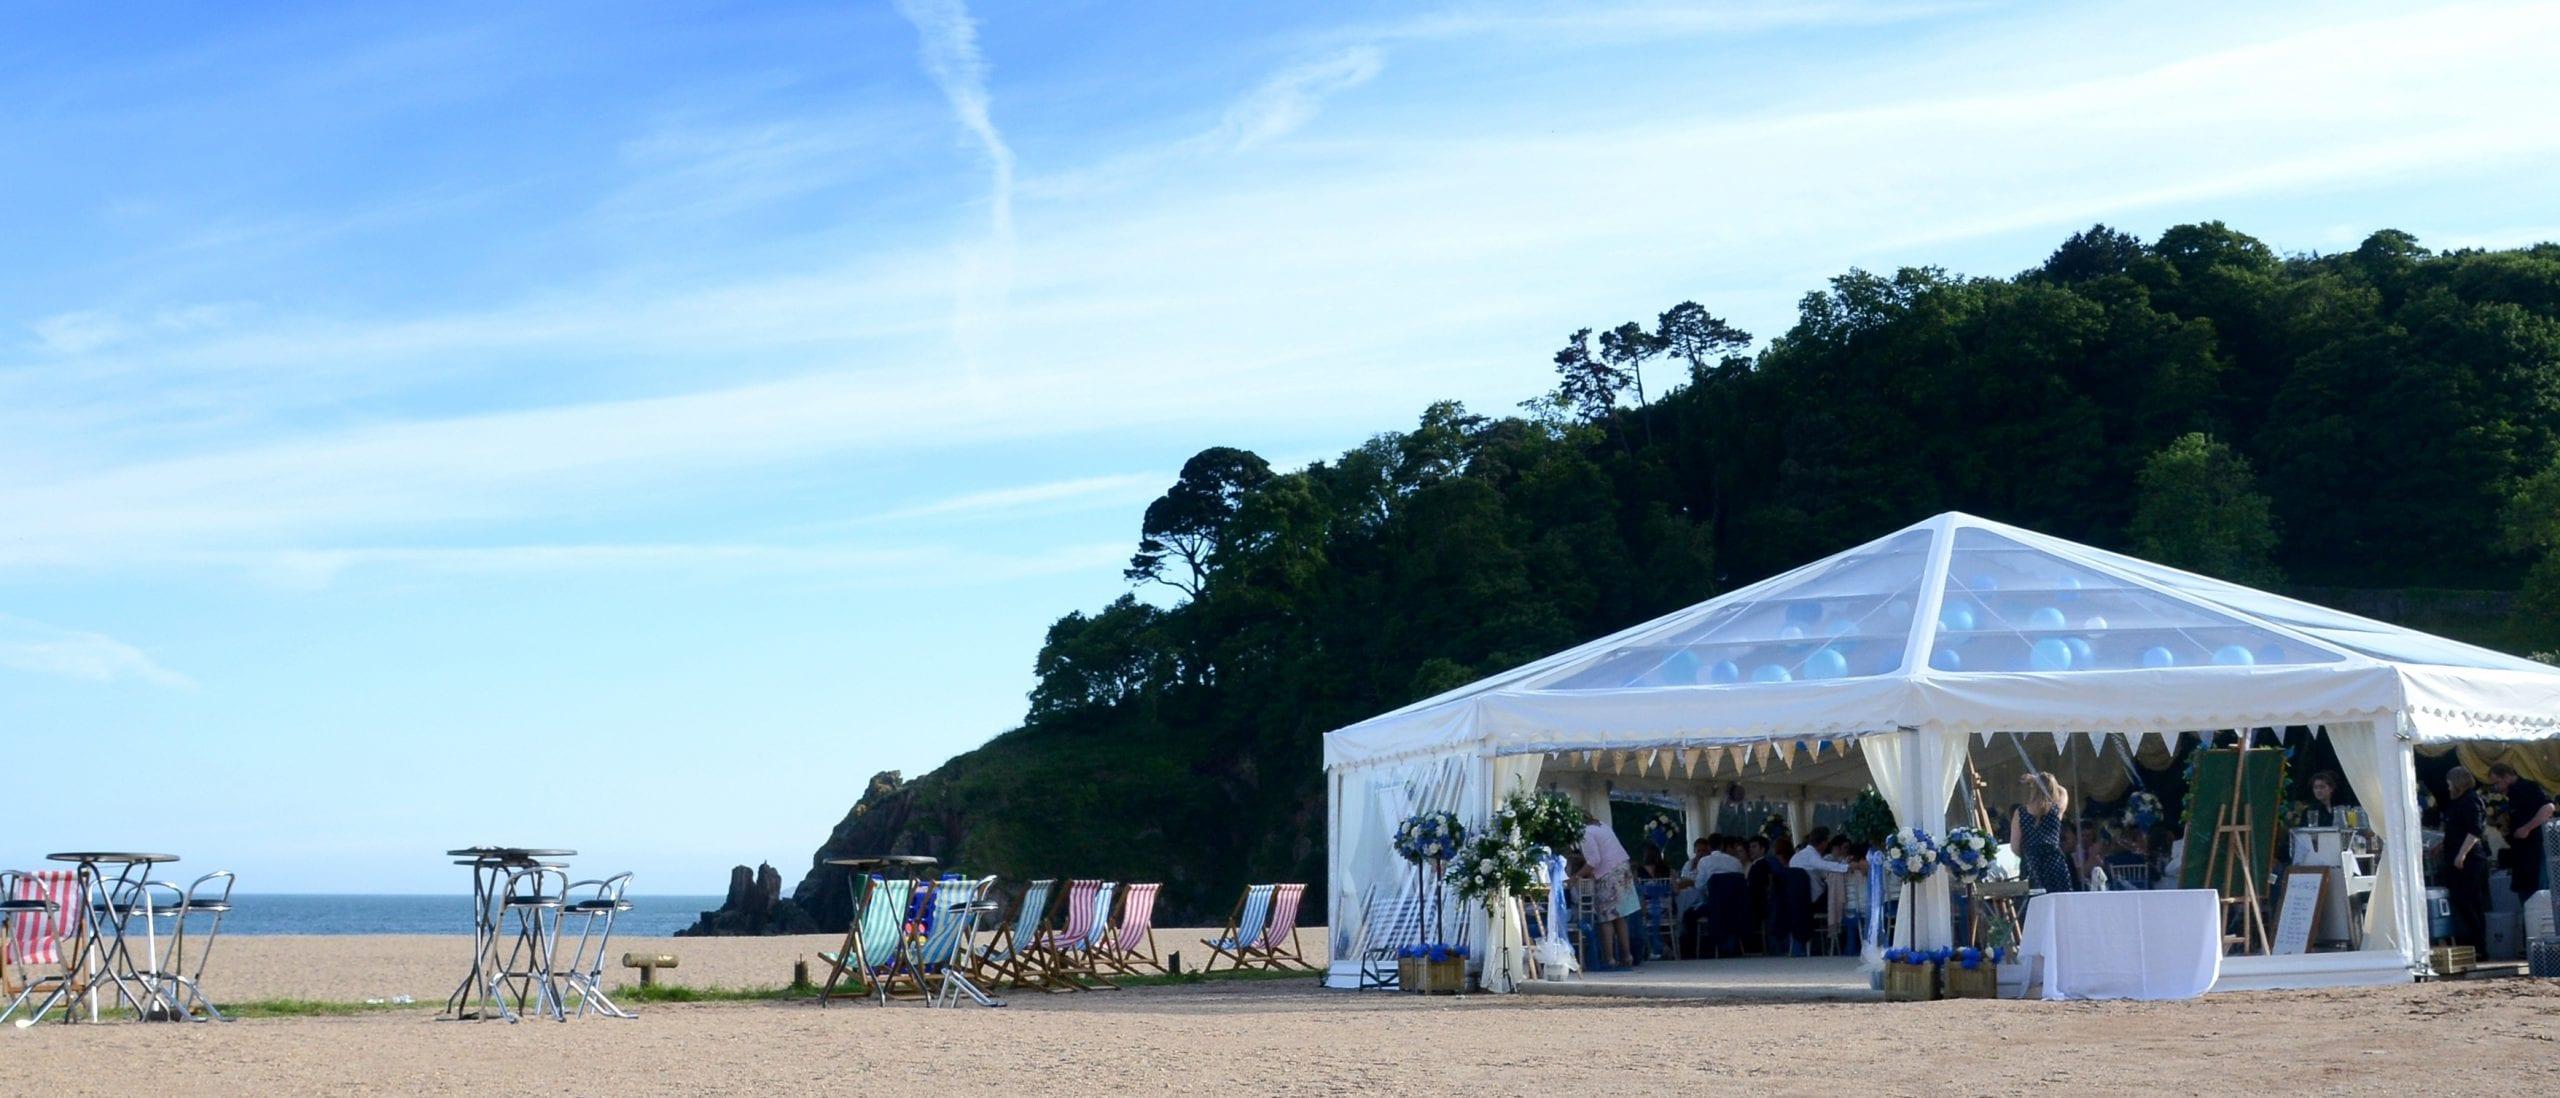 Blackpool Sands Beach Wedding Venue Hatch Marquee Hire